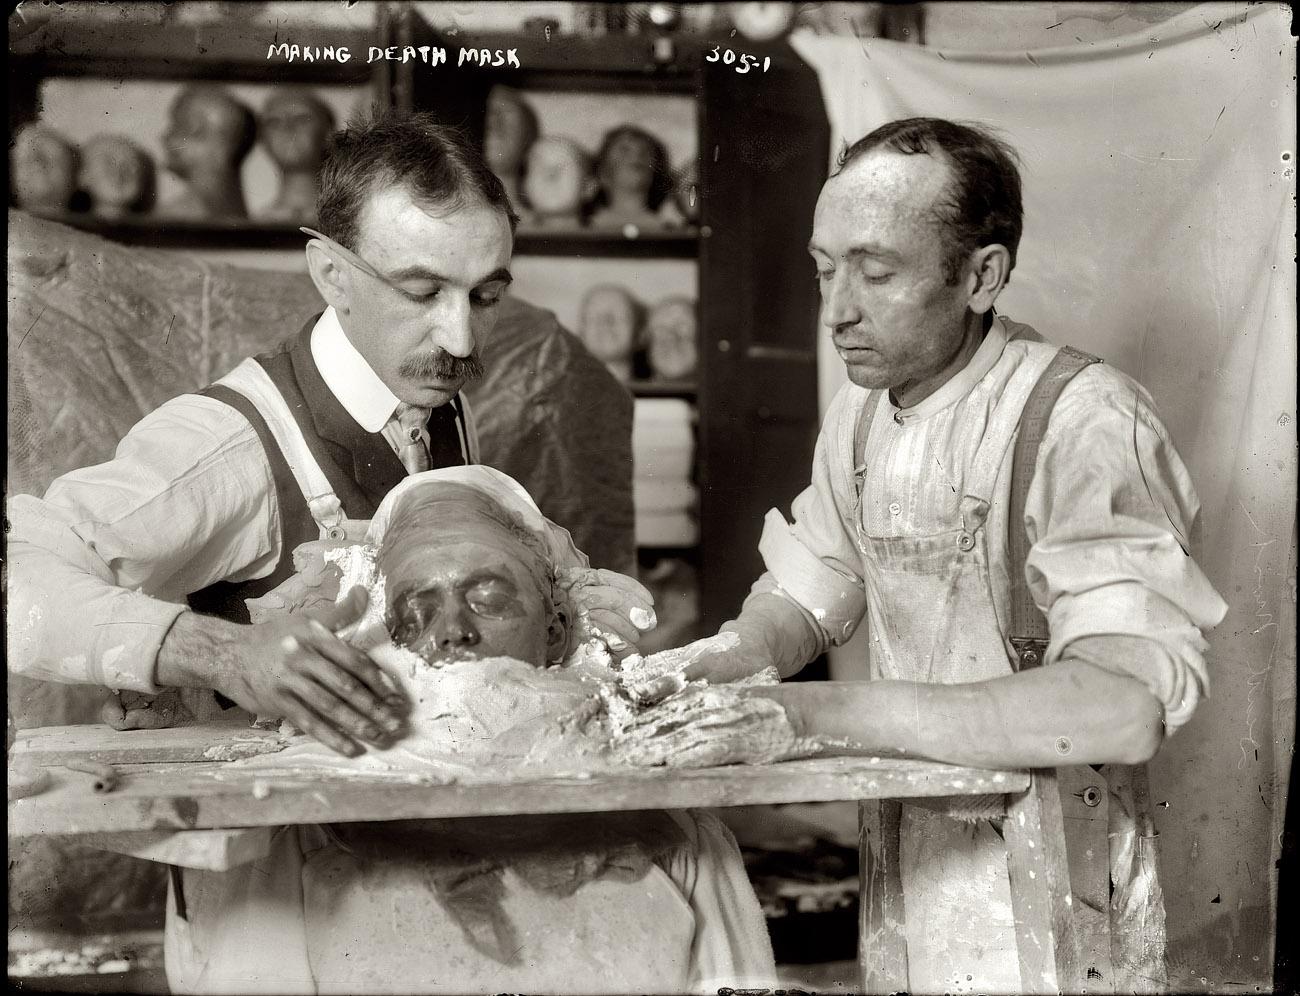 New York circa 1908. Making a plaster death mask